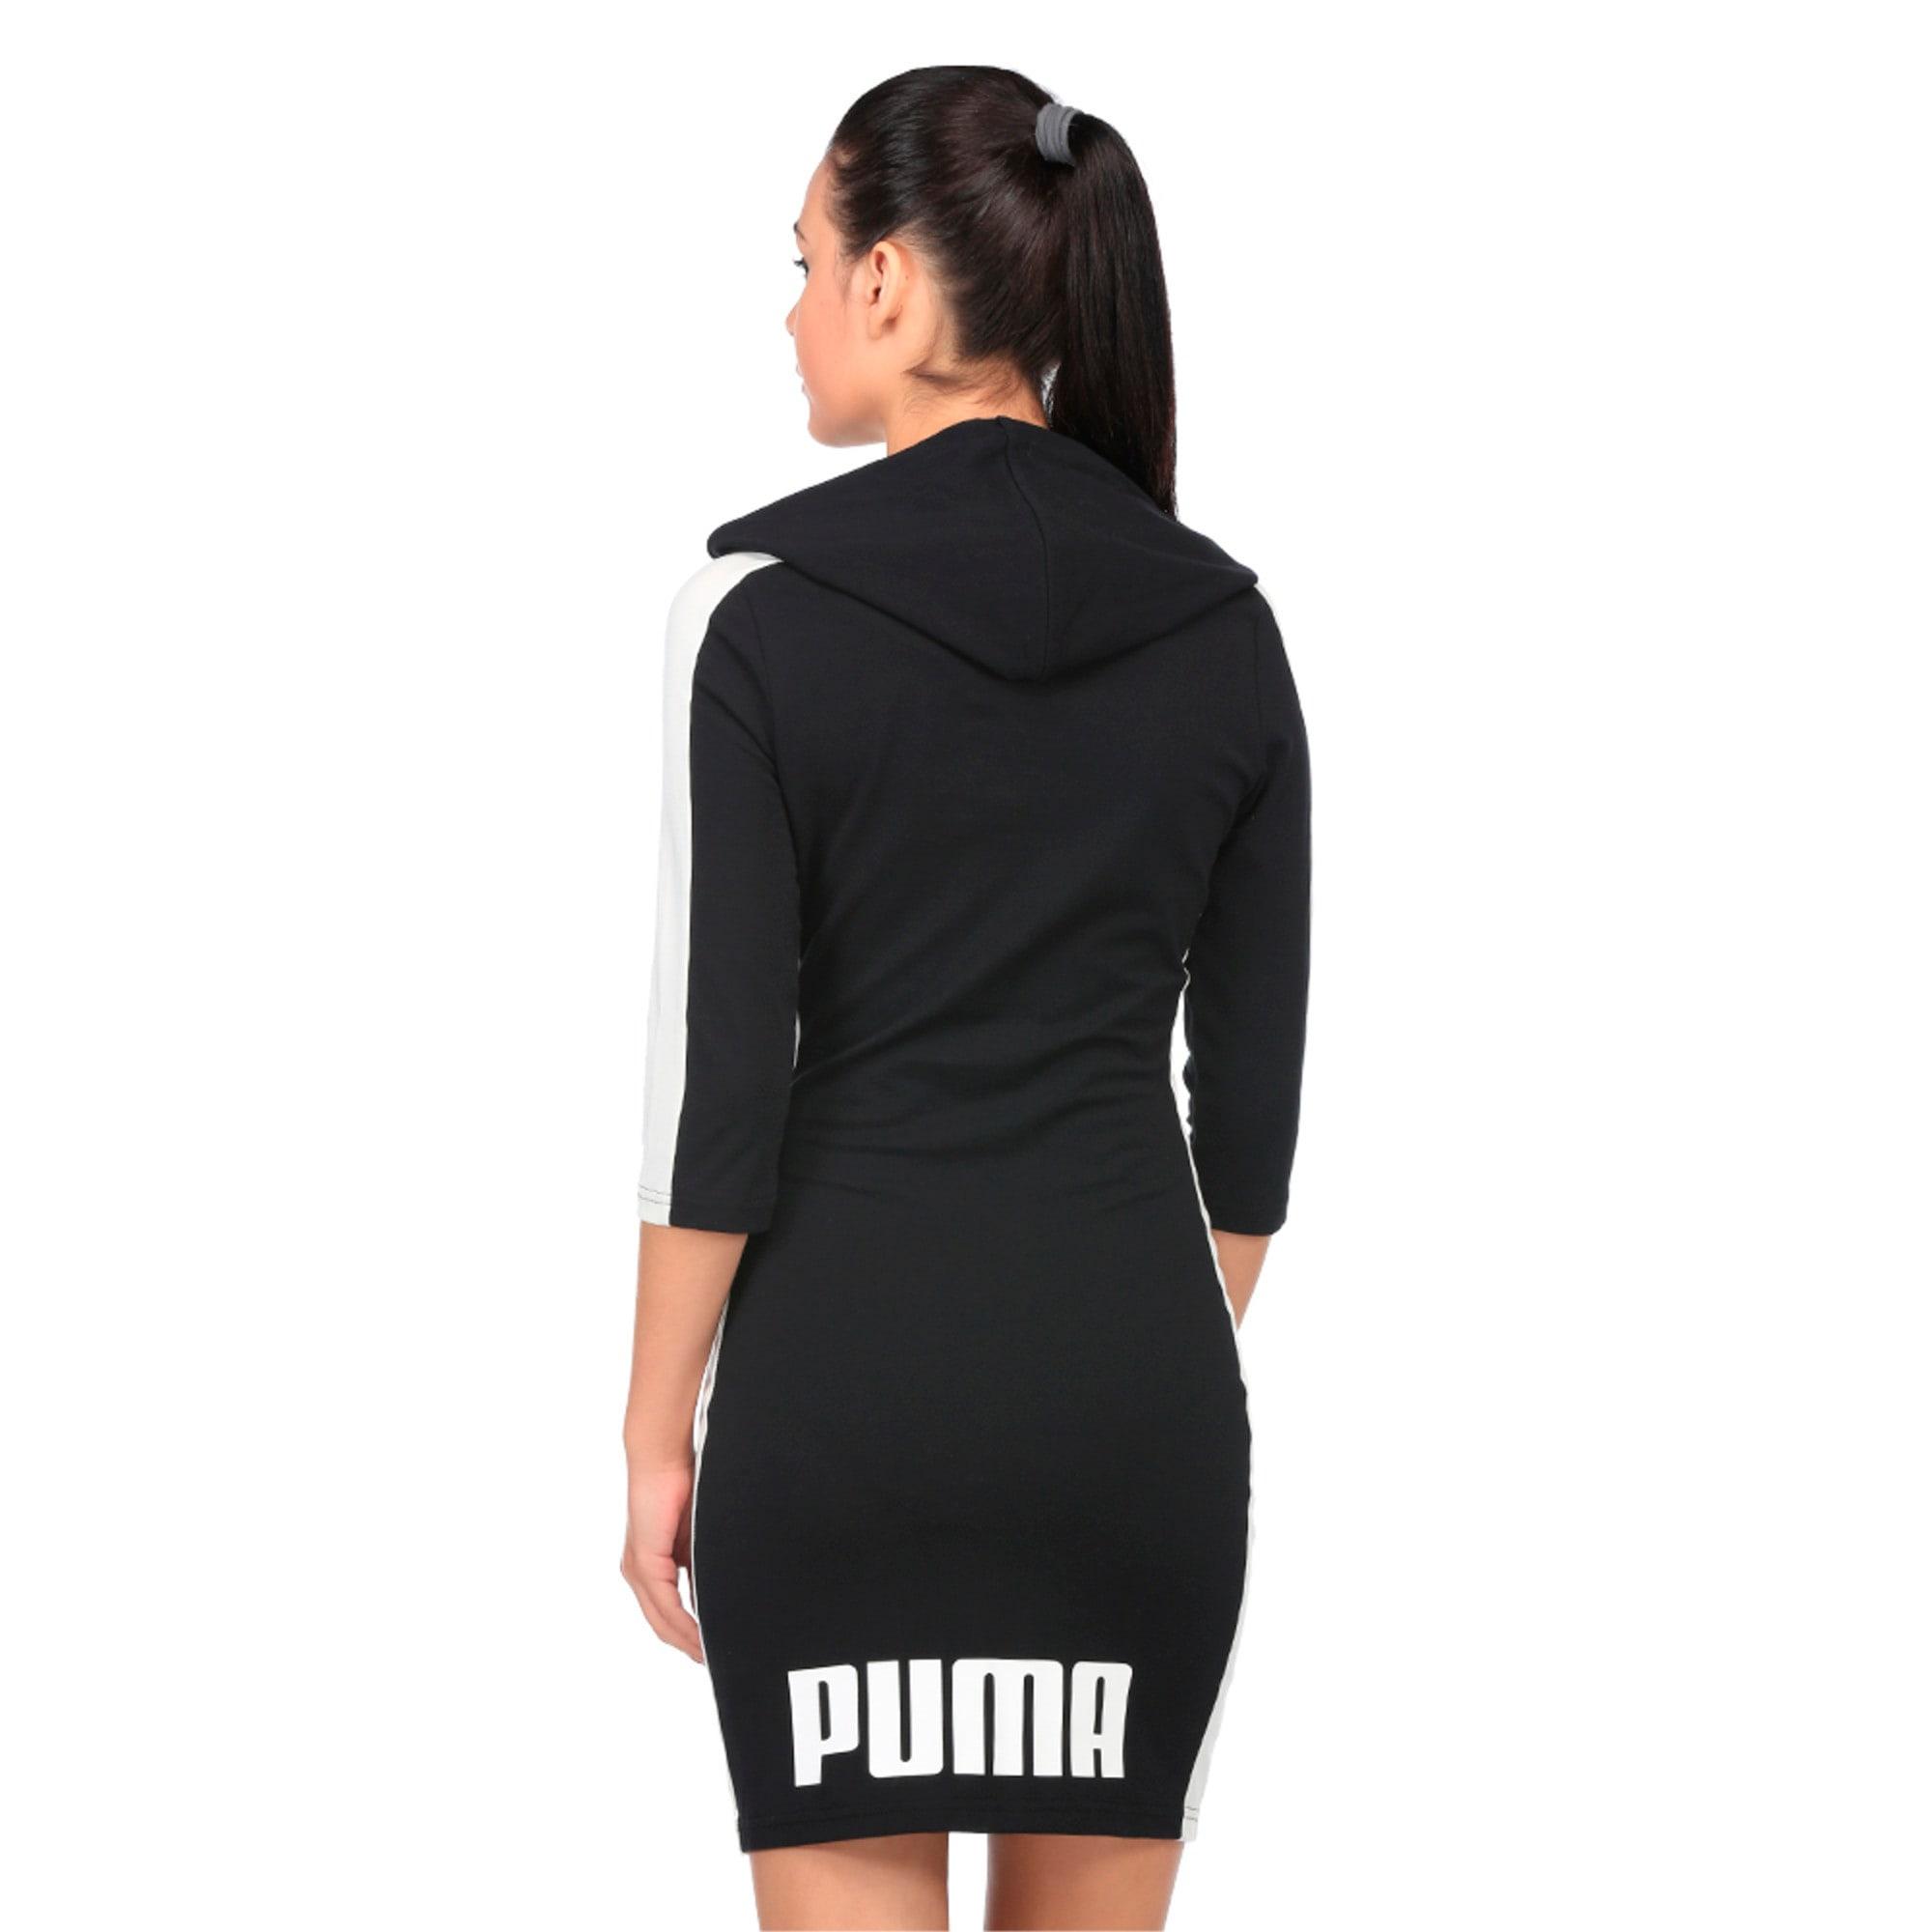 Thumbnail 4 of Archive Women's T7 Dress, Puma Black, medium-IND